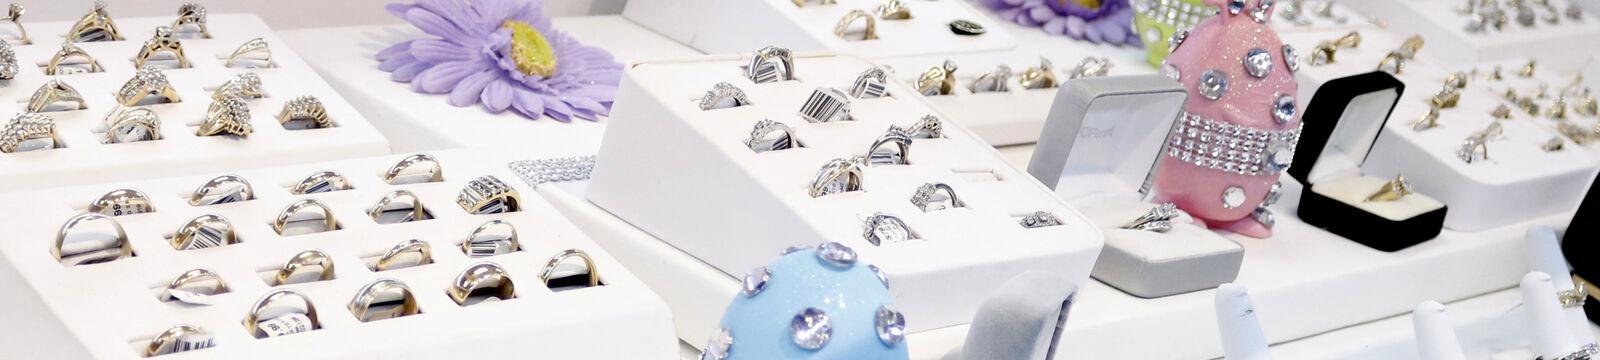 worldwidejewelrypawngoshen